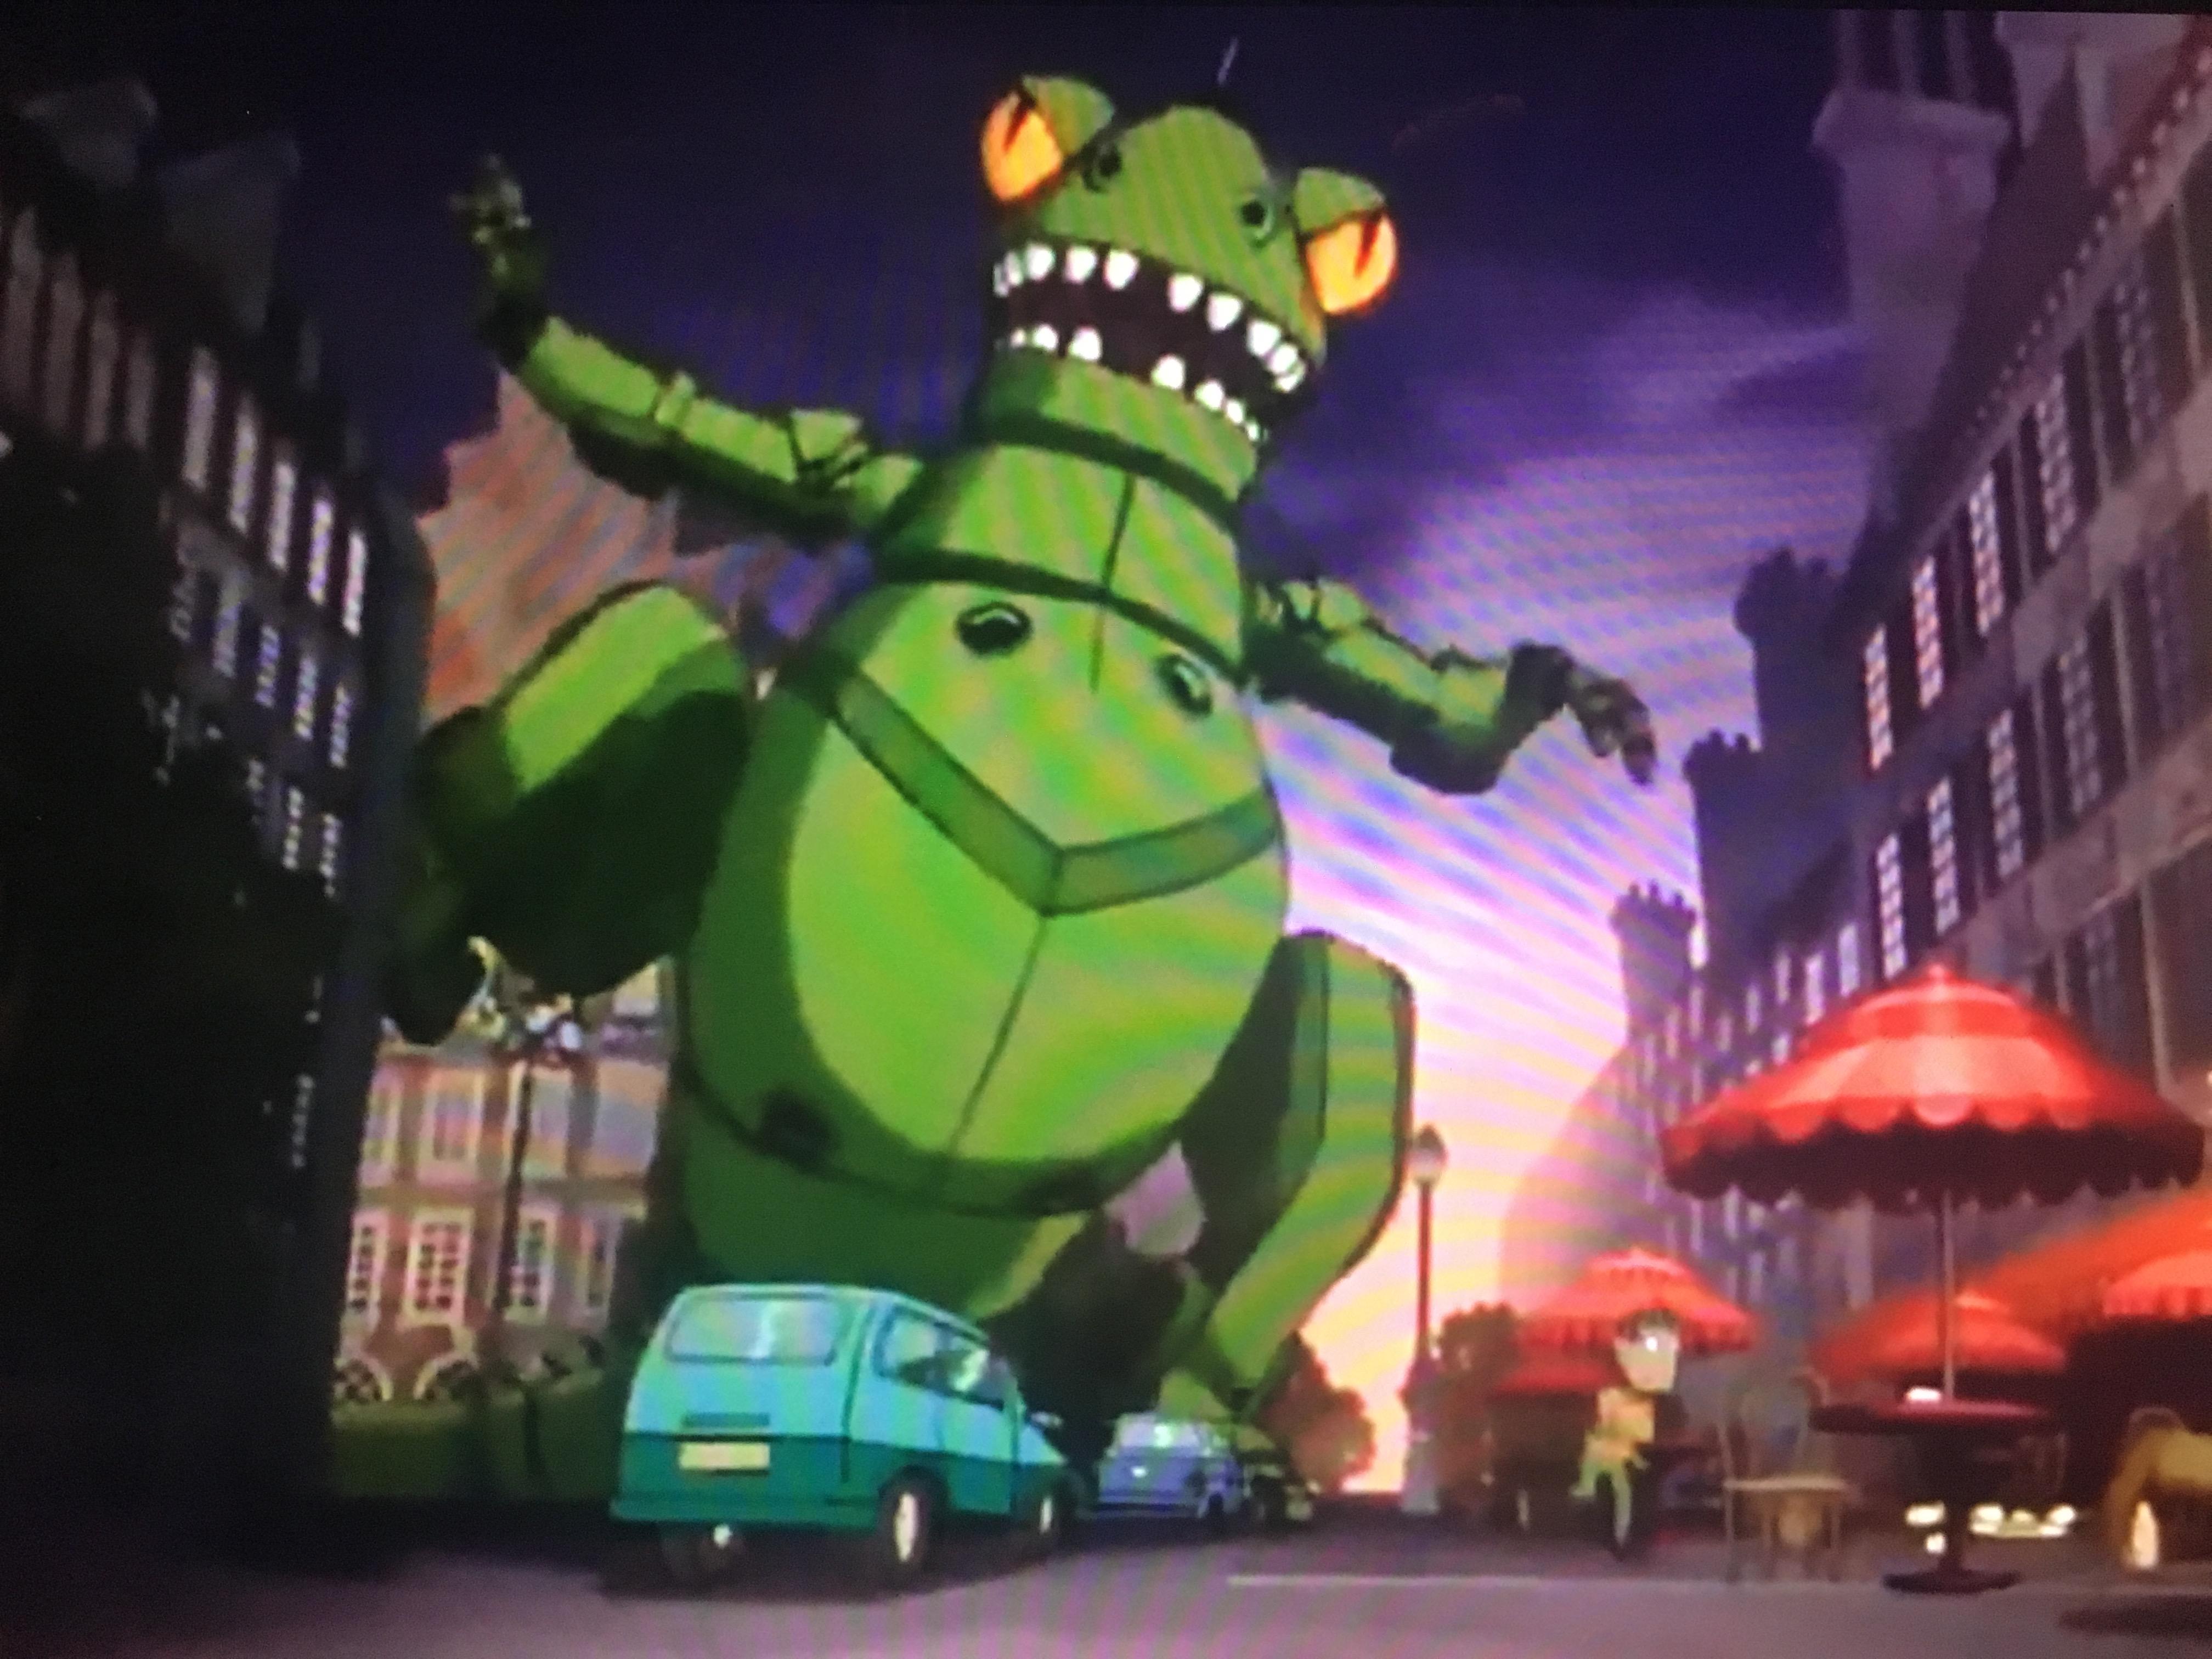 Reptar Robot Rugrats Wiki Fandom